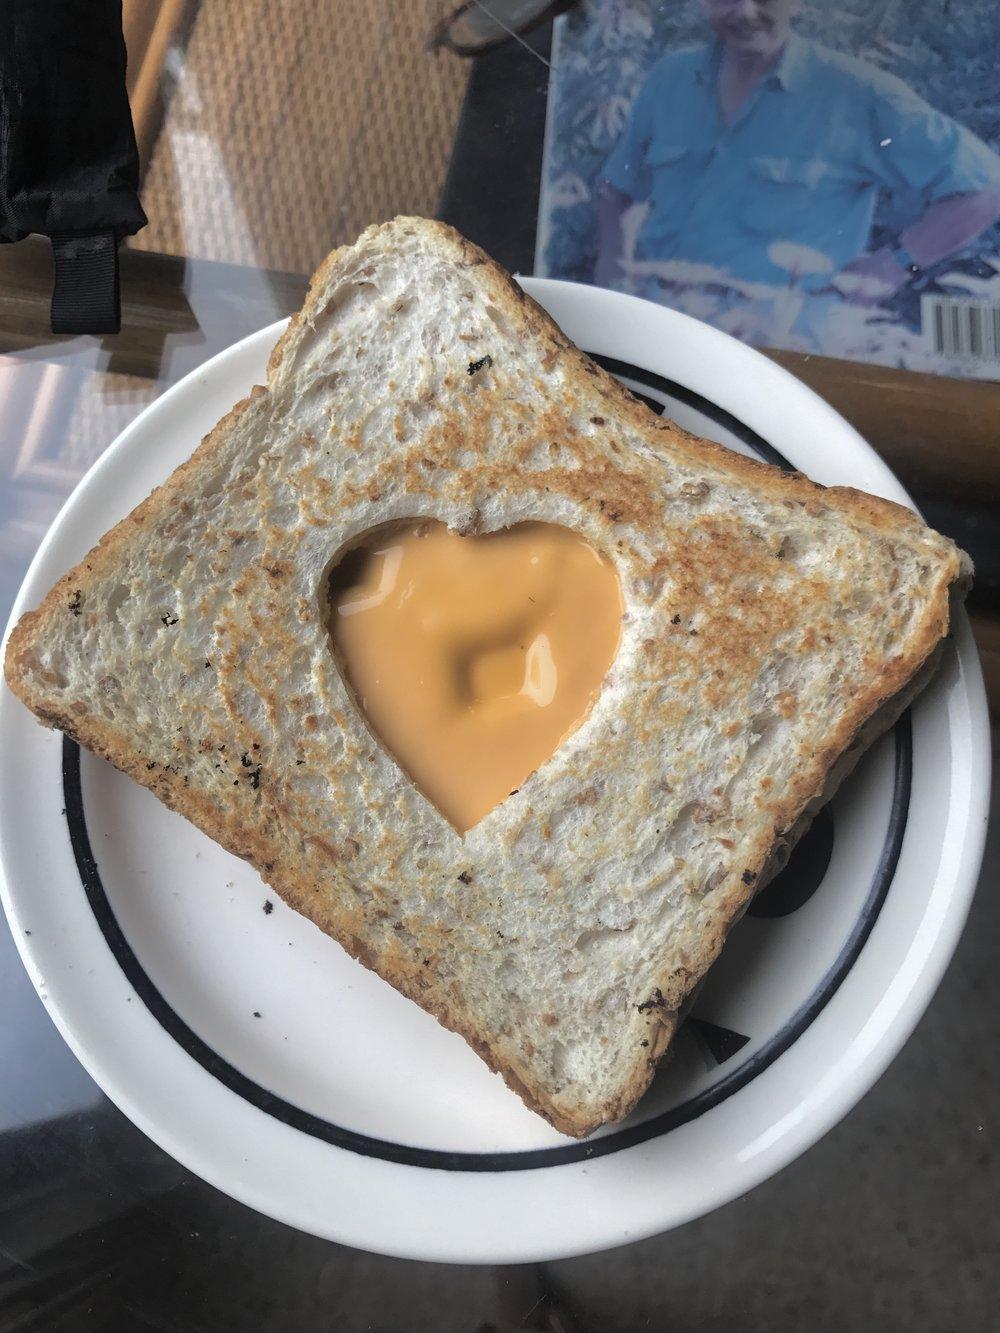 One strange sandwich.